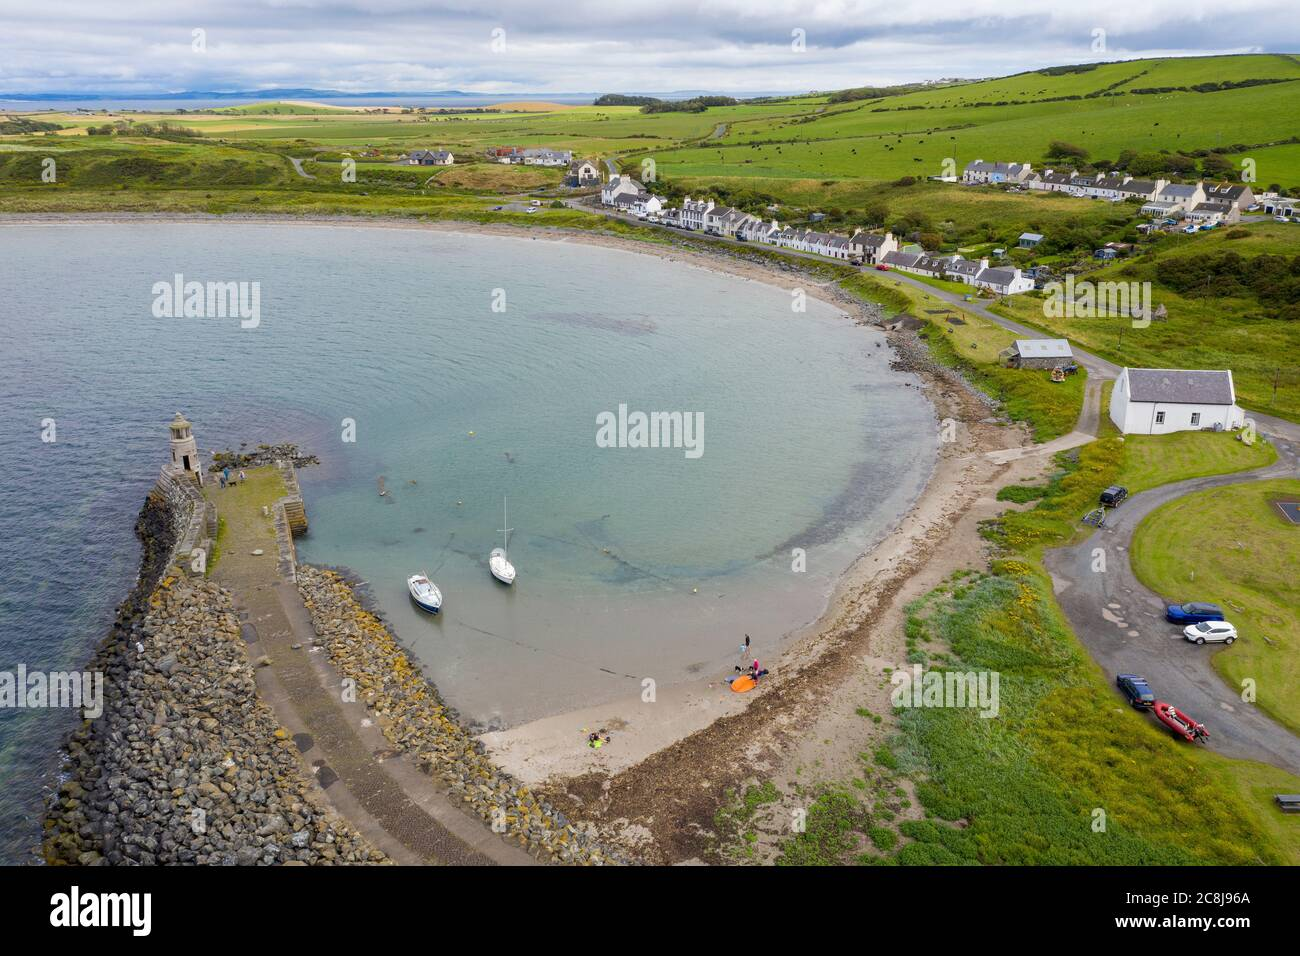 Aerial view of Port Logan, Dumfries & Galloway, Scotland. . Stock Photo